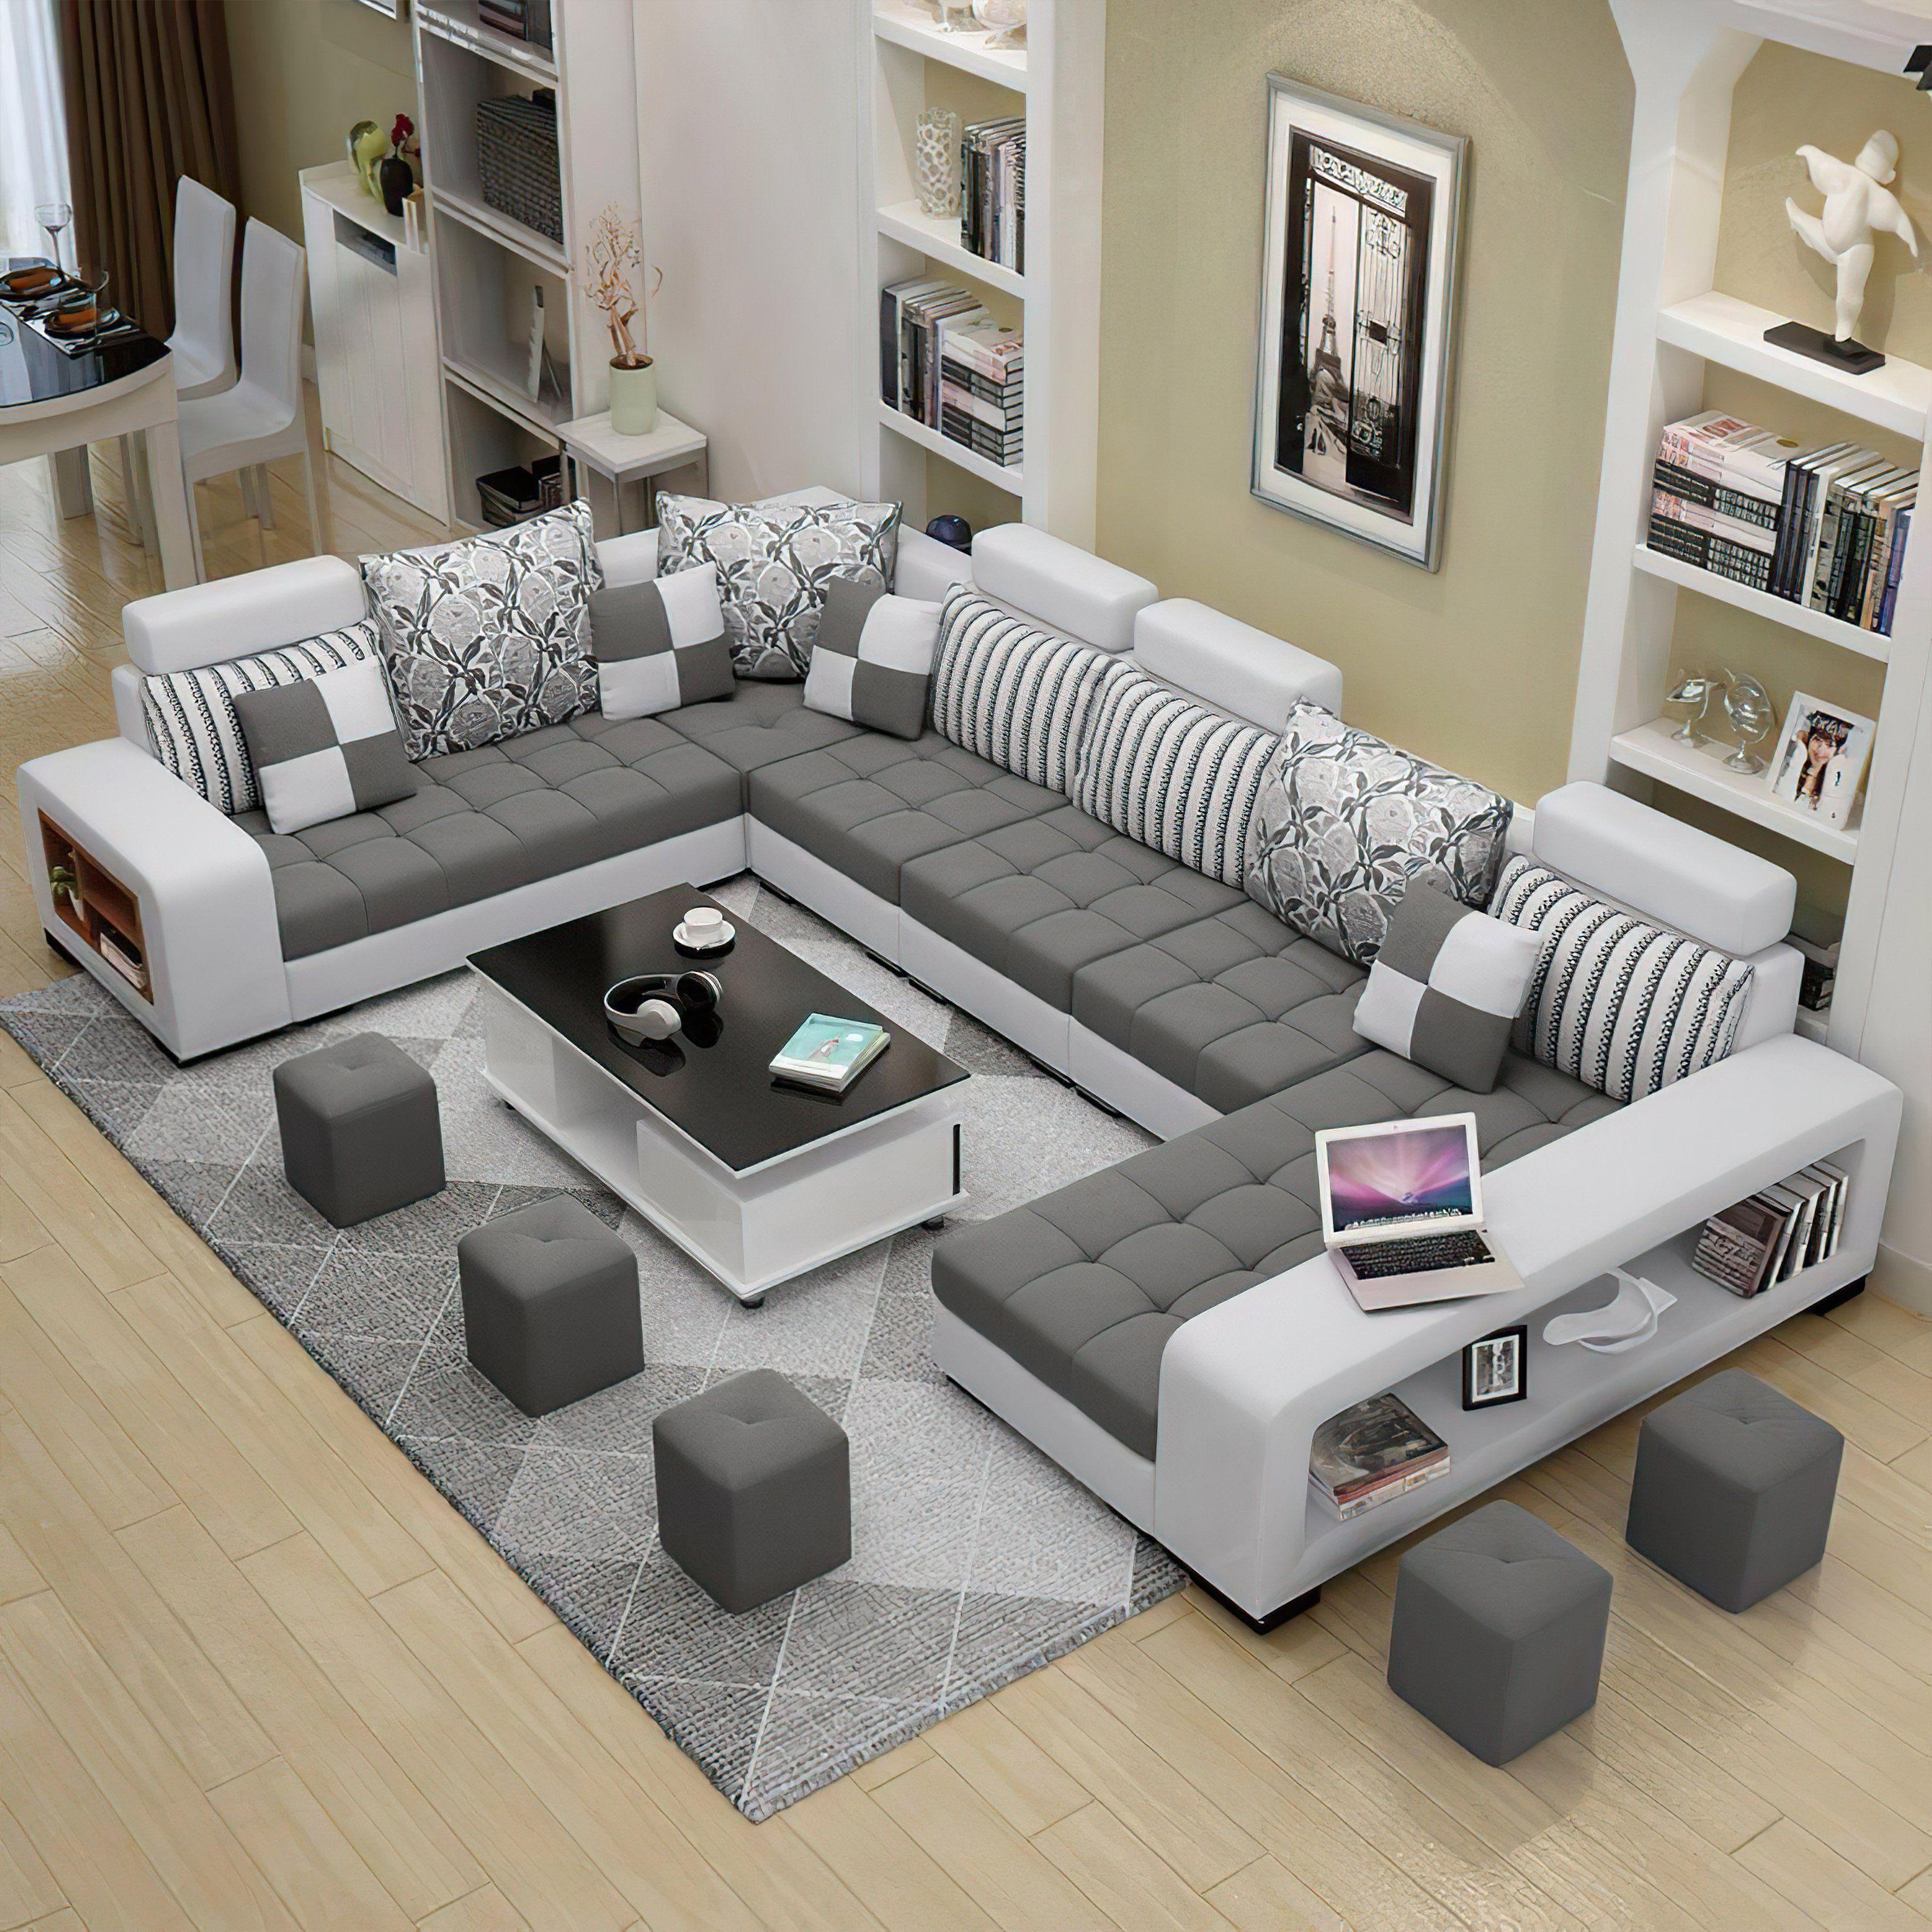 Selena Modular Tufted Sectional In 2021 Furniture Design Living Room Luxury Sofa Design Living Room Sofa Design